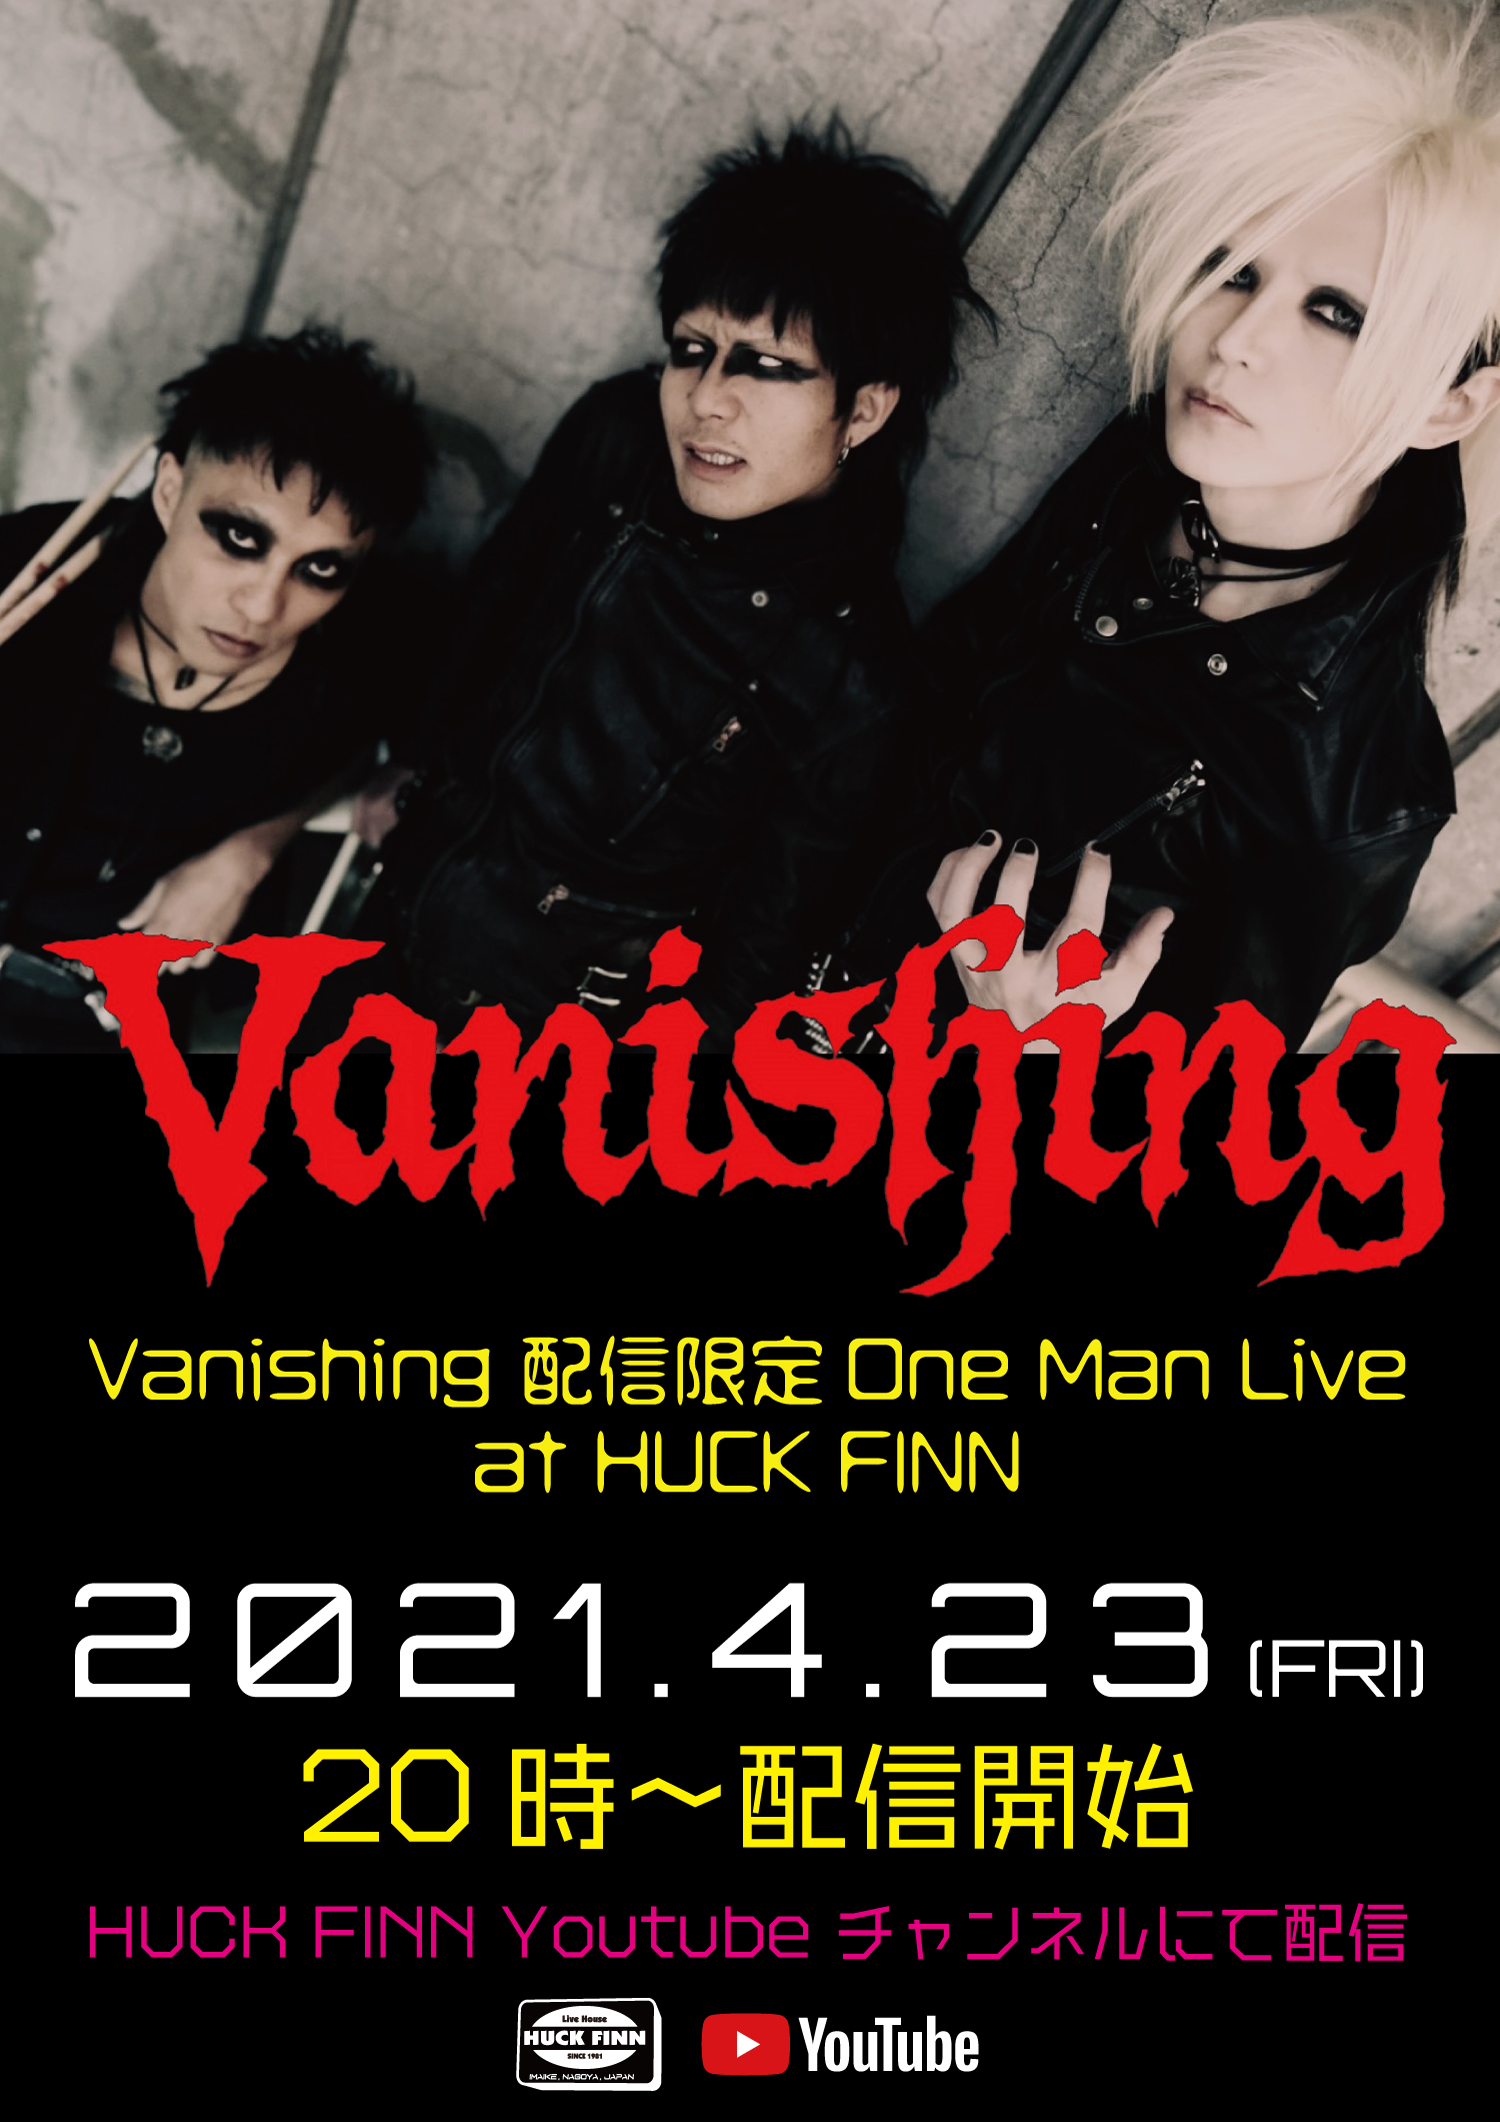 [Vanishing 配信限定 One Man Live]